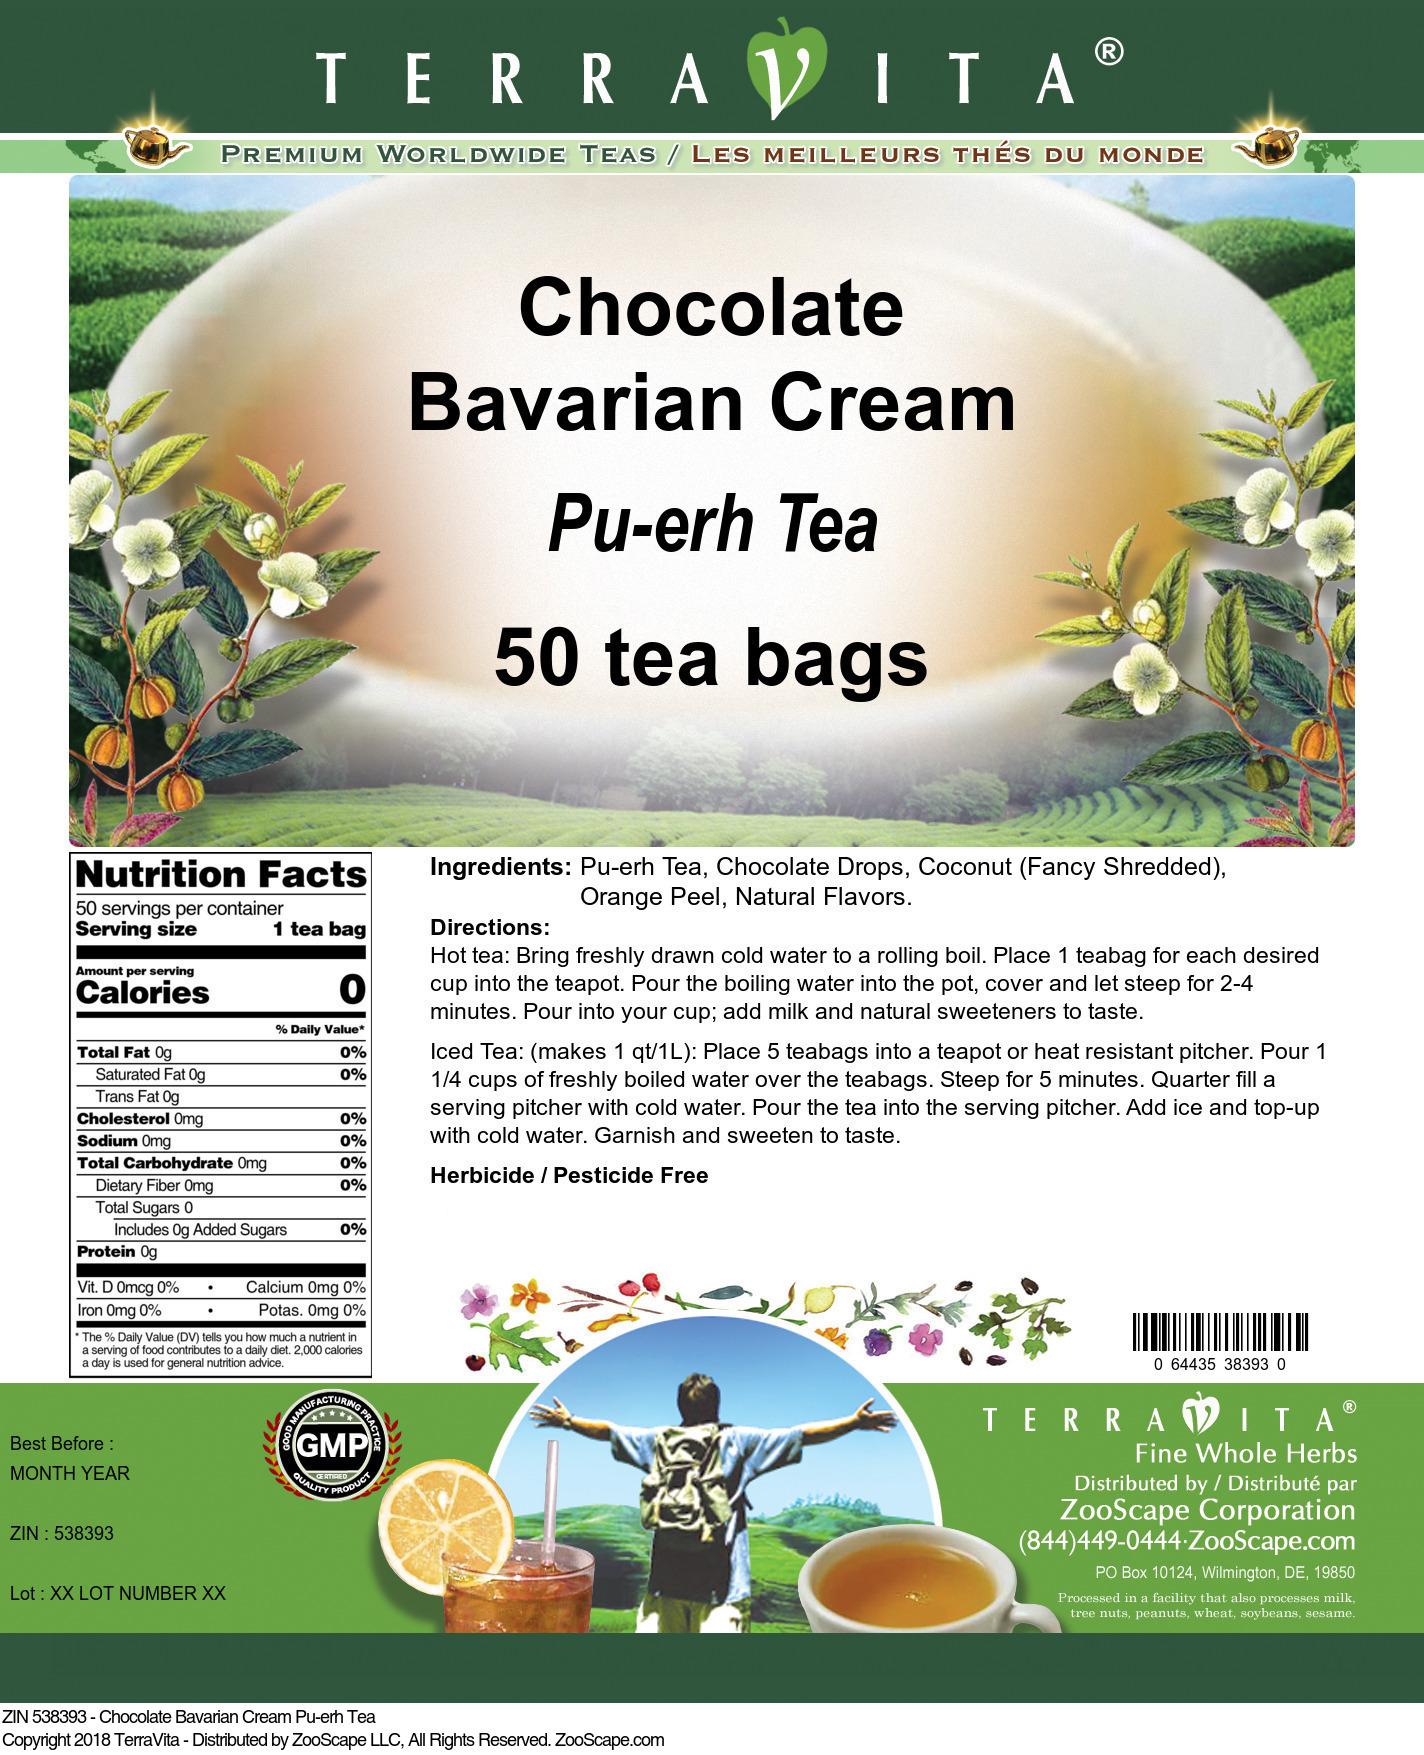 Chocolate Bavarian Cream Pu-erh Tea